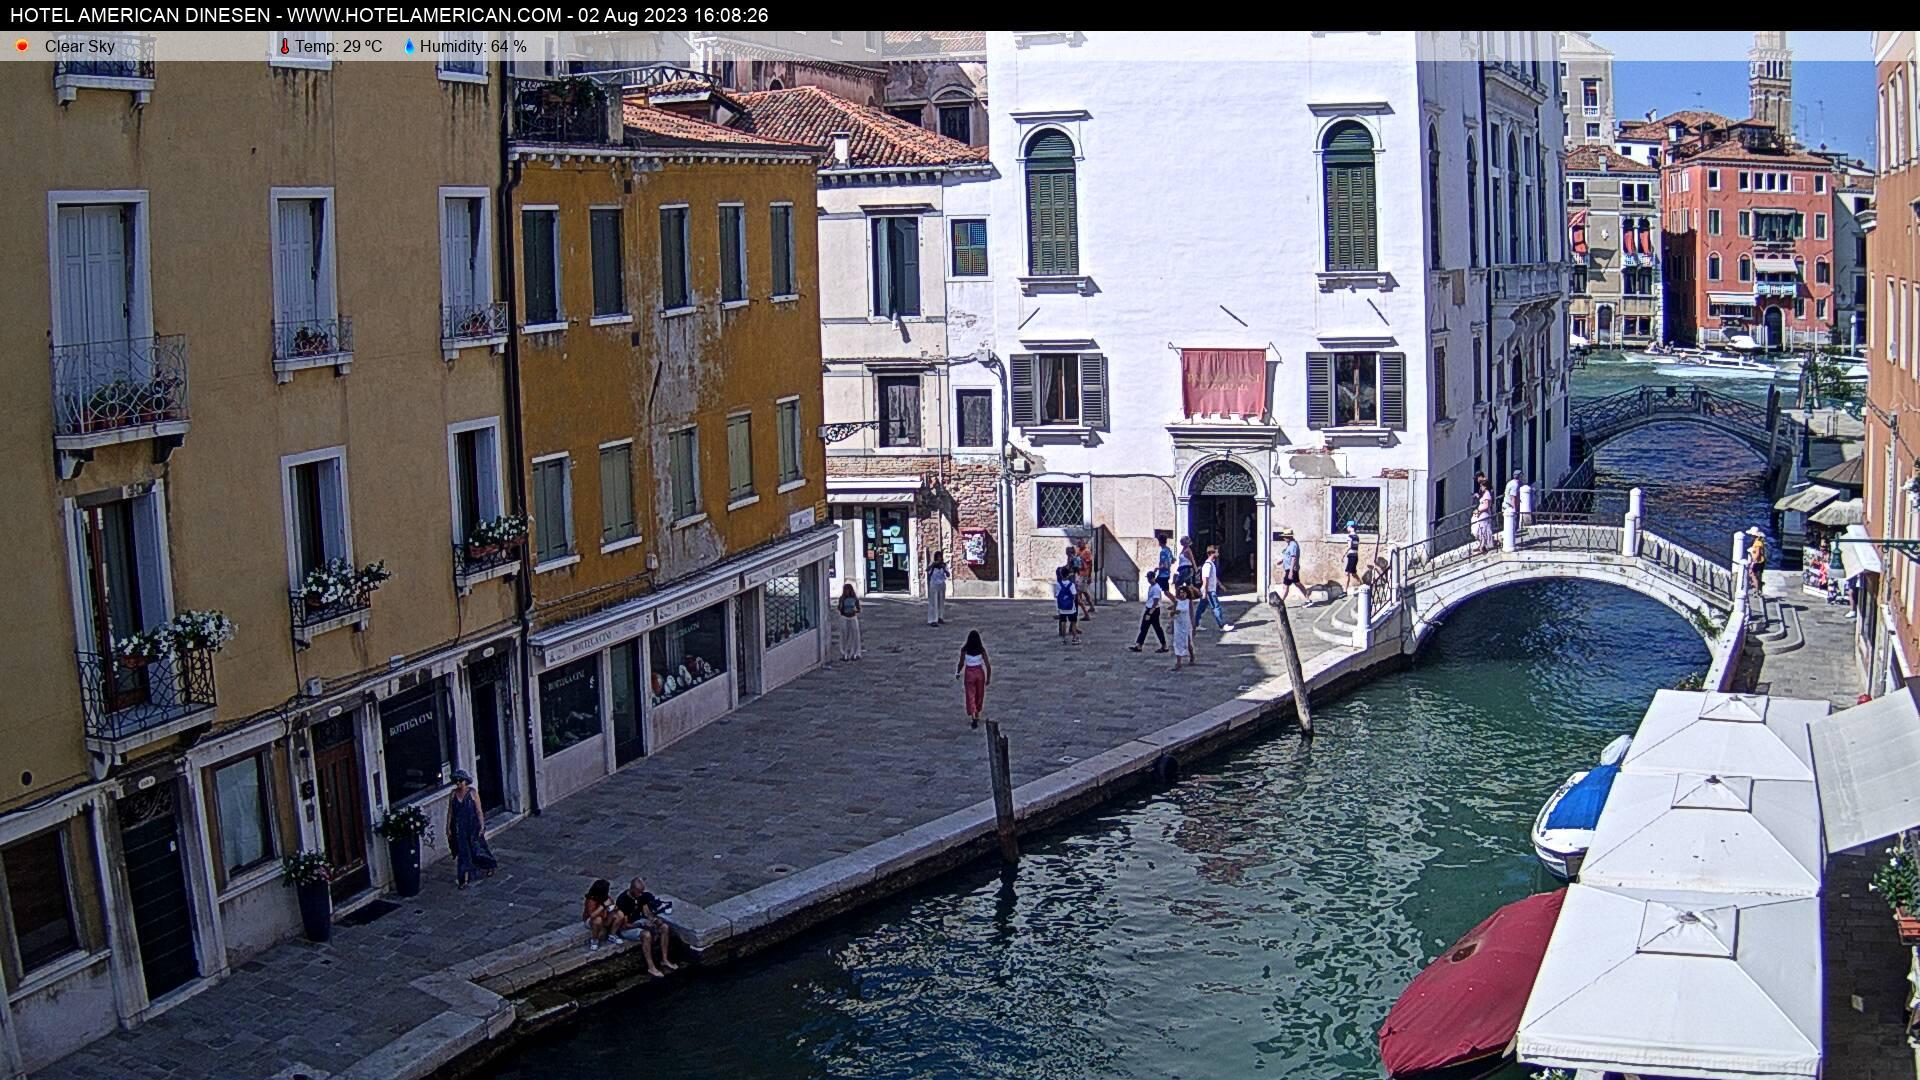 Venedig Sa. 16:08